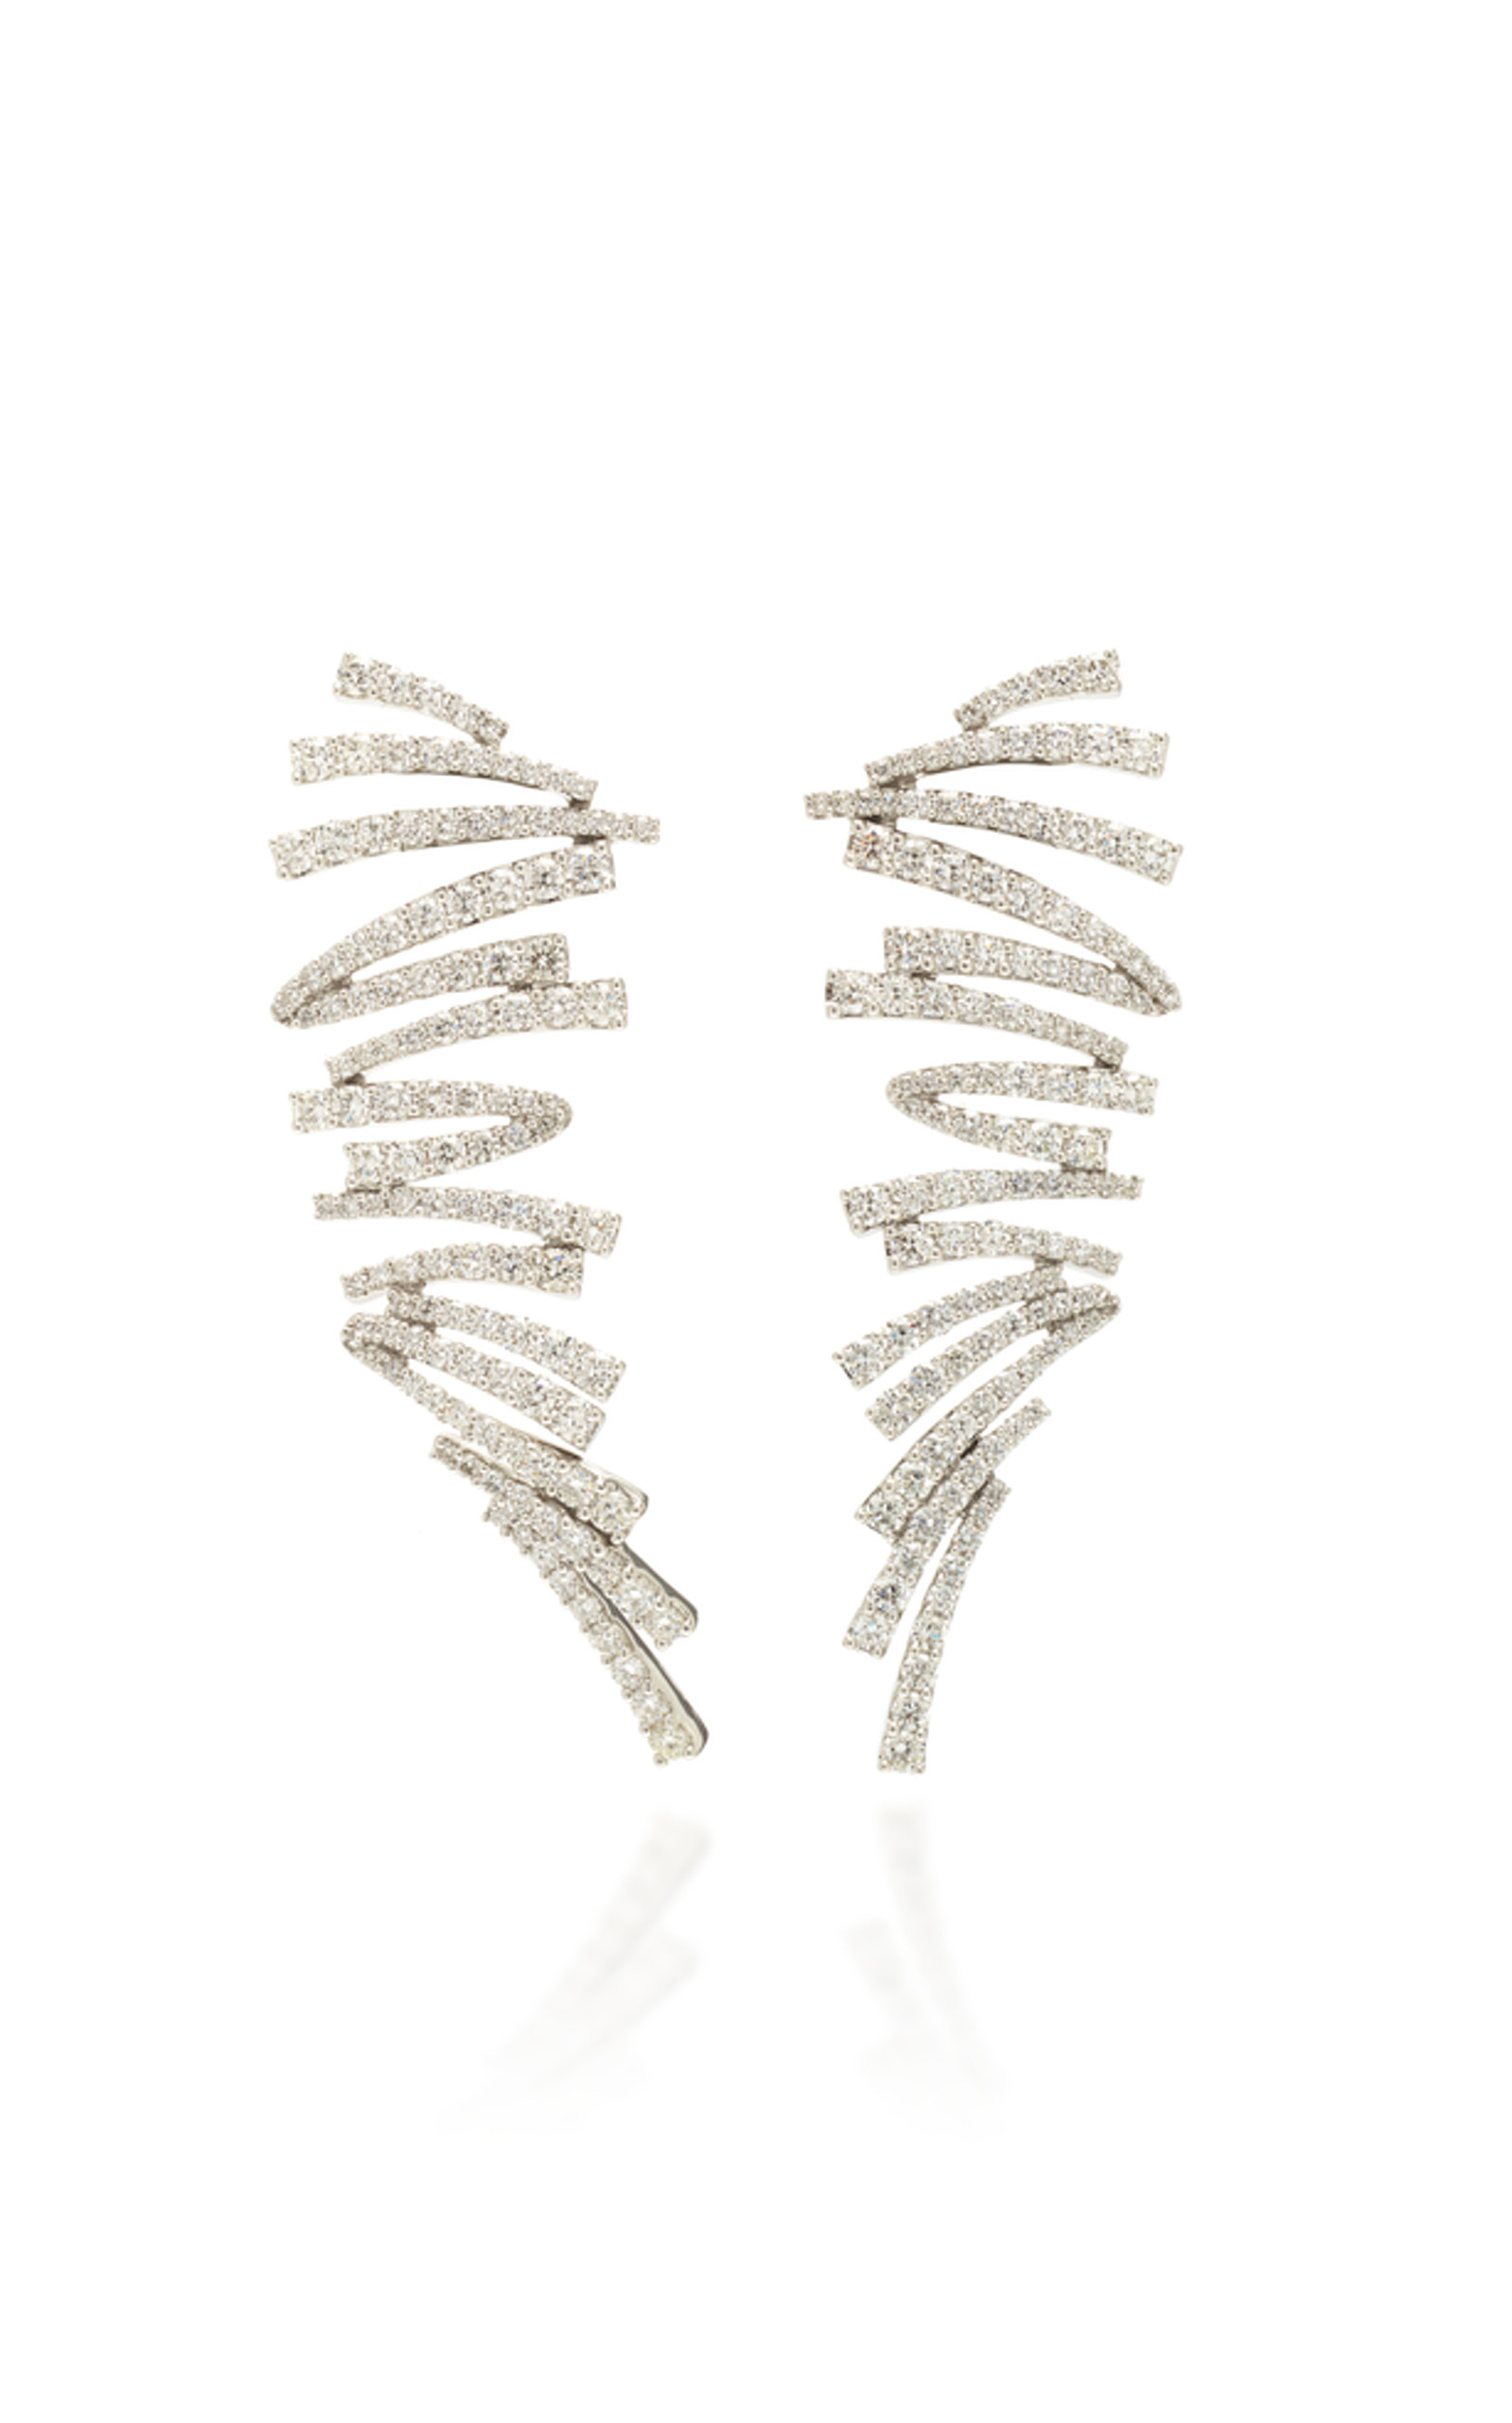 HUEB LABYRINTH WHITE GOLD AND DIAMOND EARRINGS